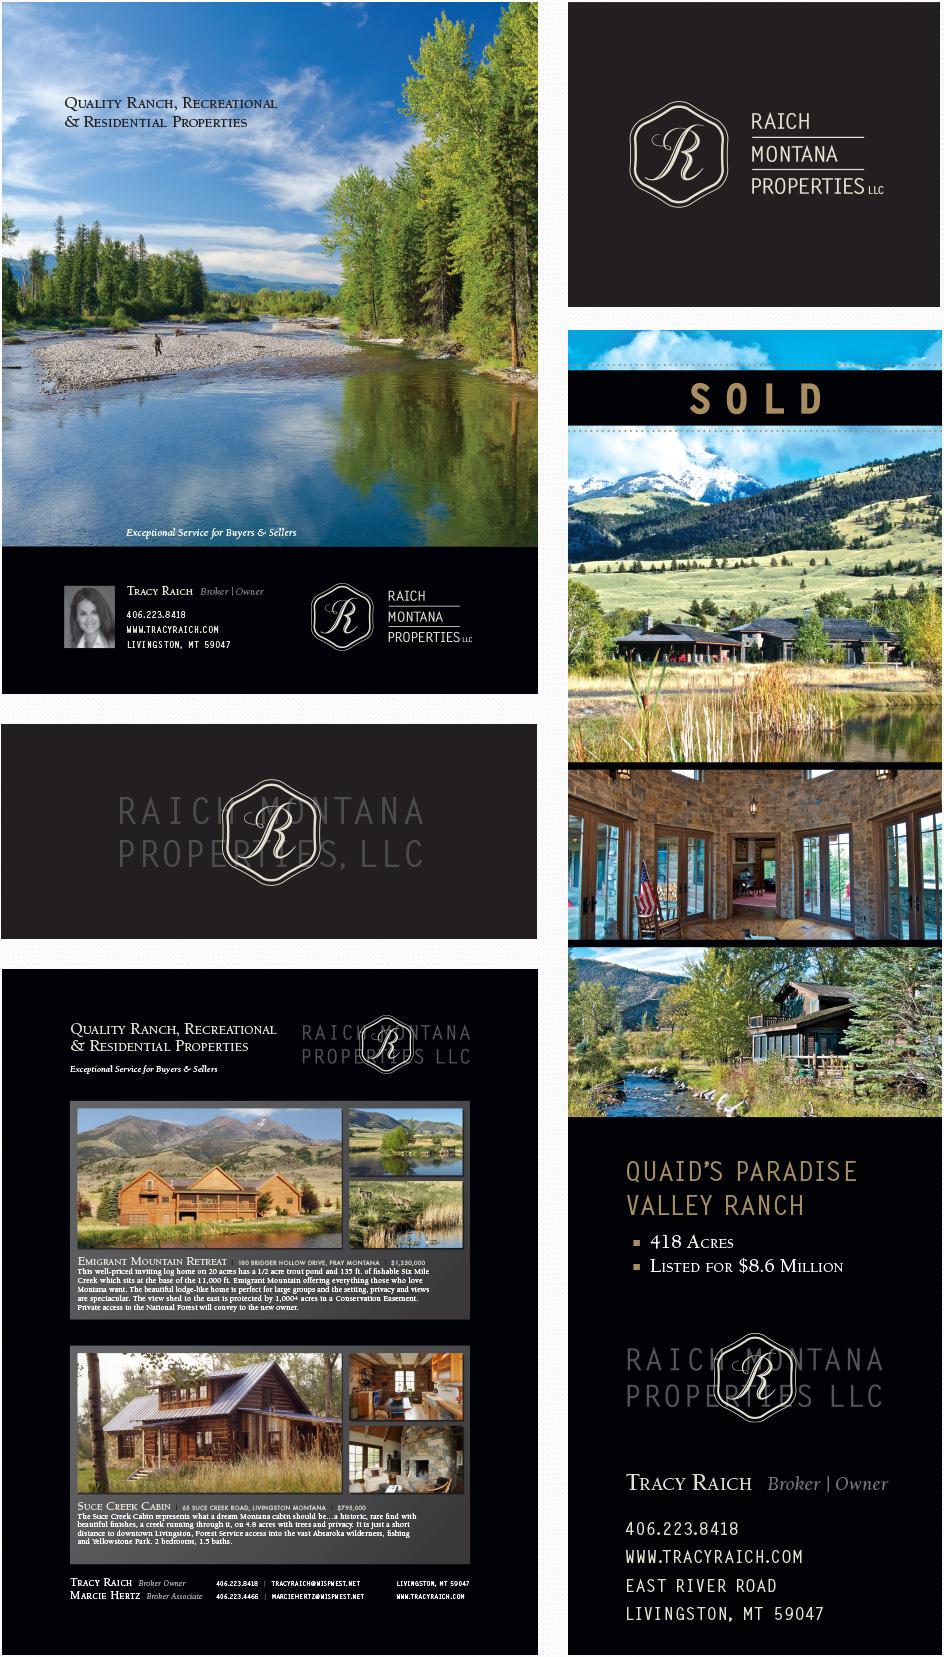 Tracy Raich Properties